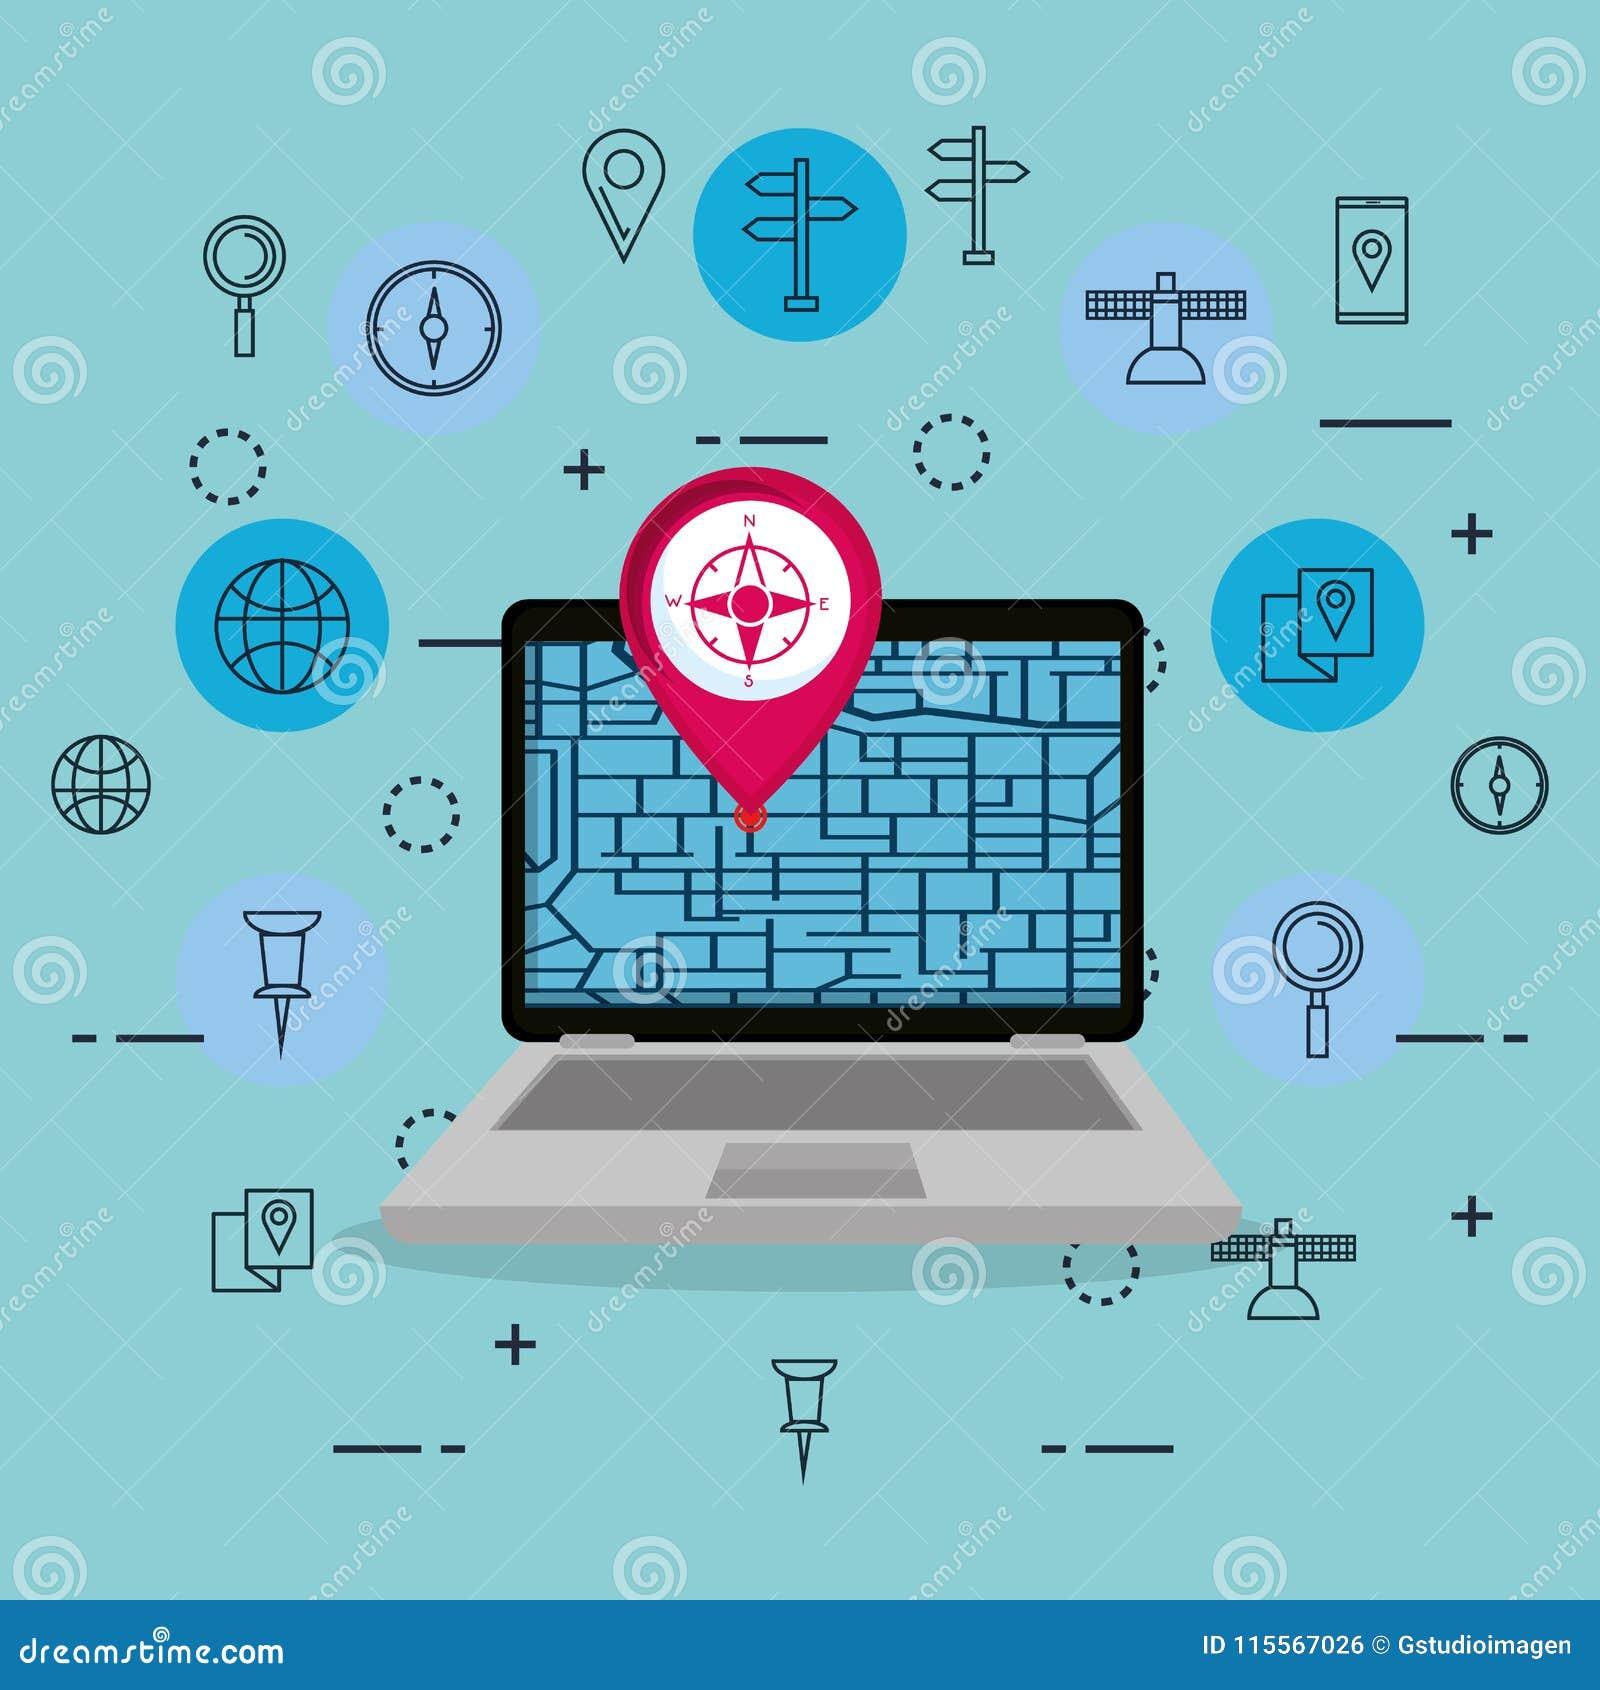 gps navigation software for laptop free download